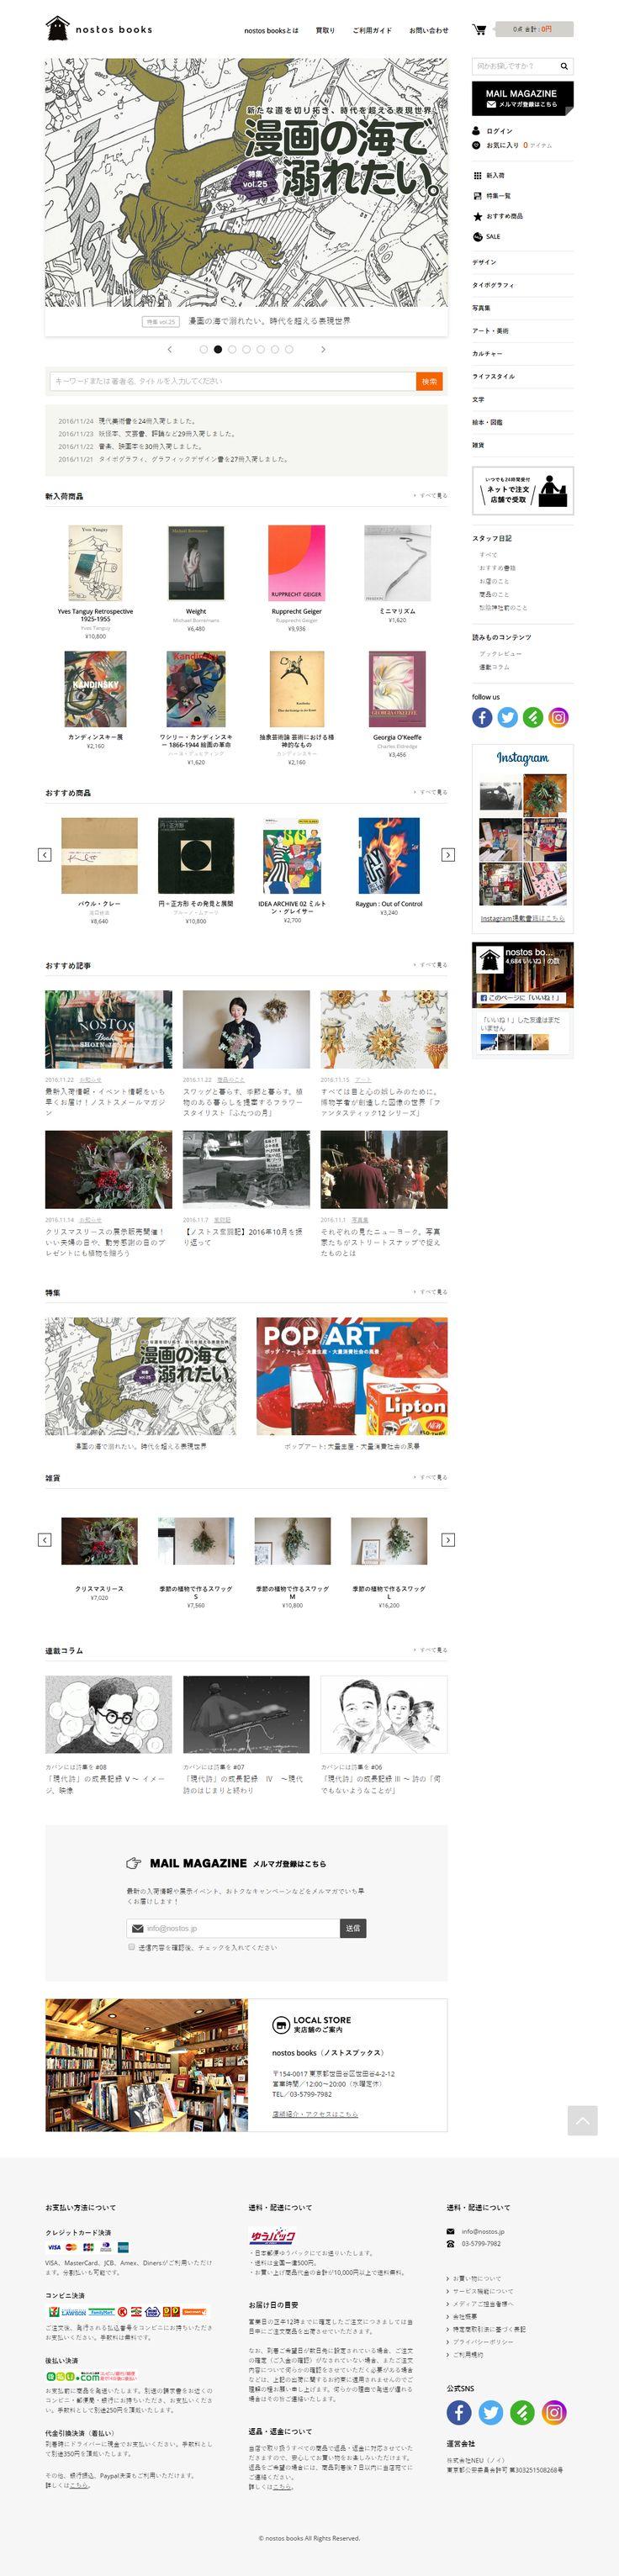 #shopping-store-web-design #ec #2-column-layout-rightnavi #key-color-black #bg-color-white #Japanese #Photographic #Slider